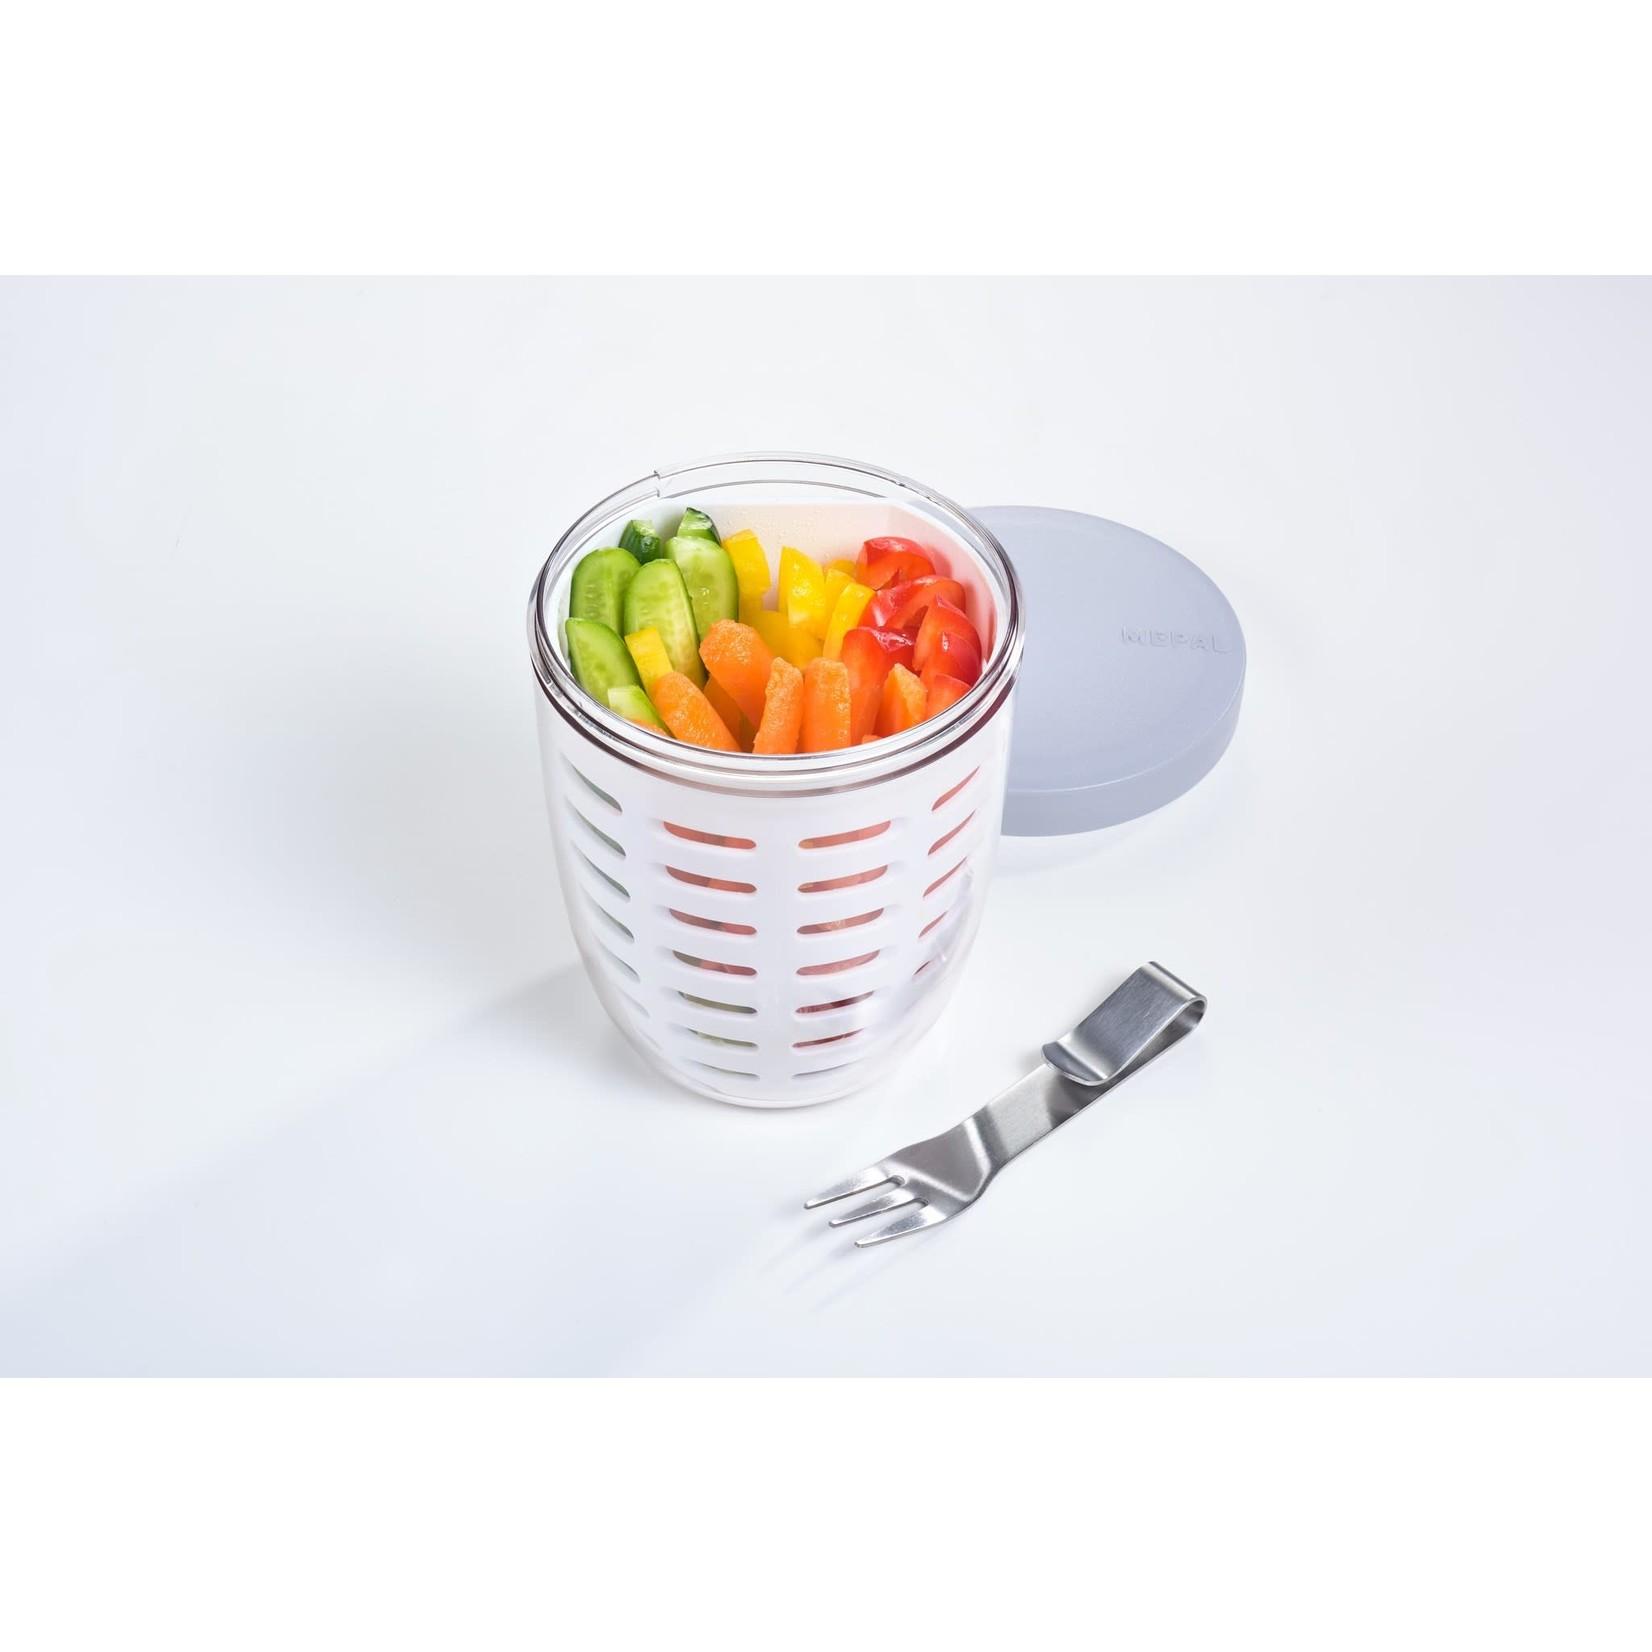 Mepal Bol fruits et légumes - Blanc